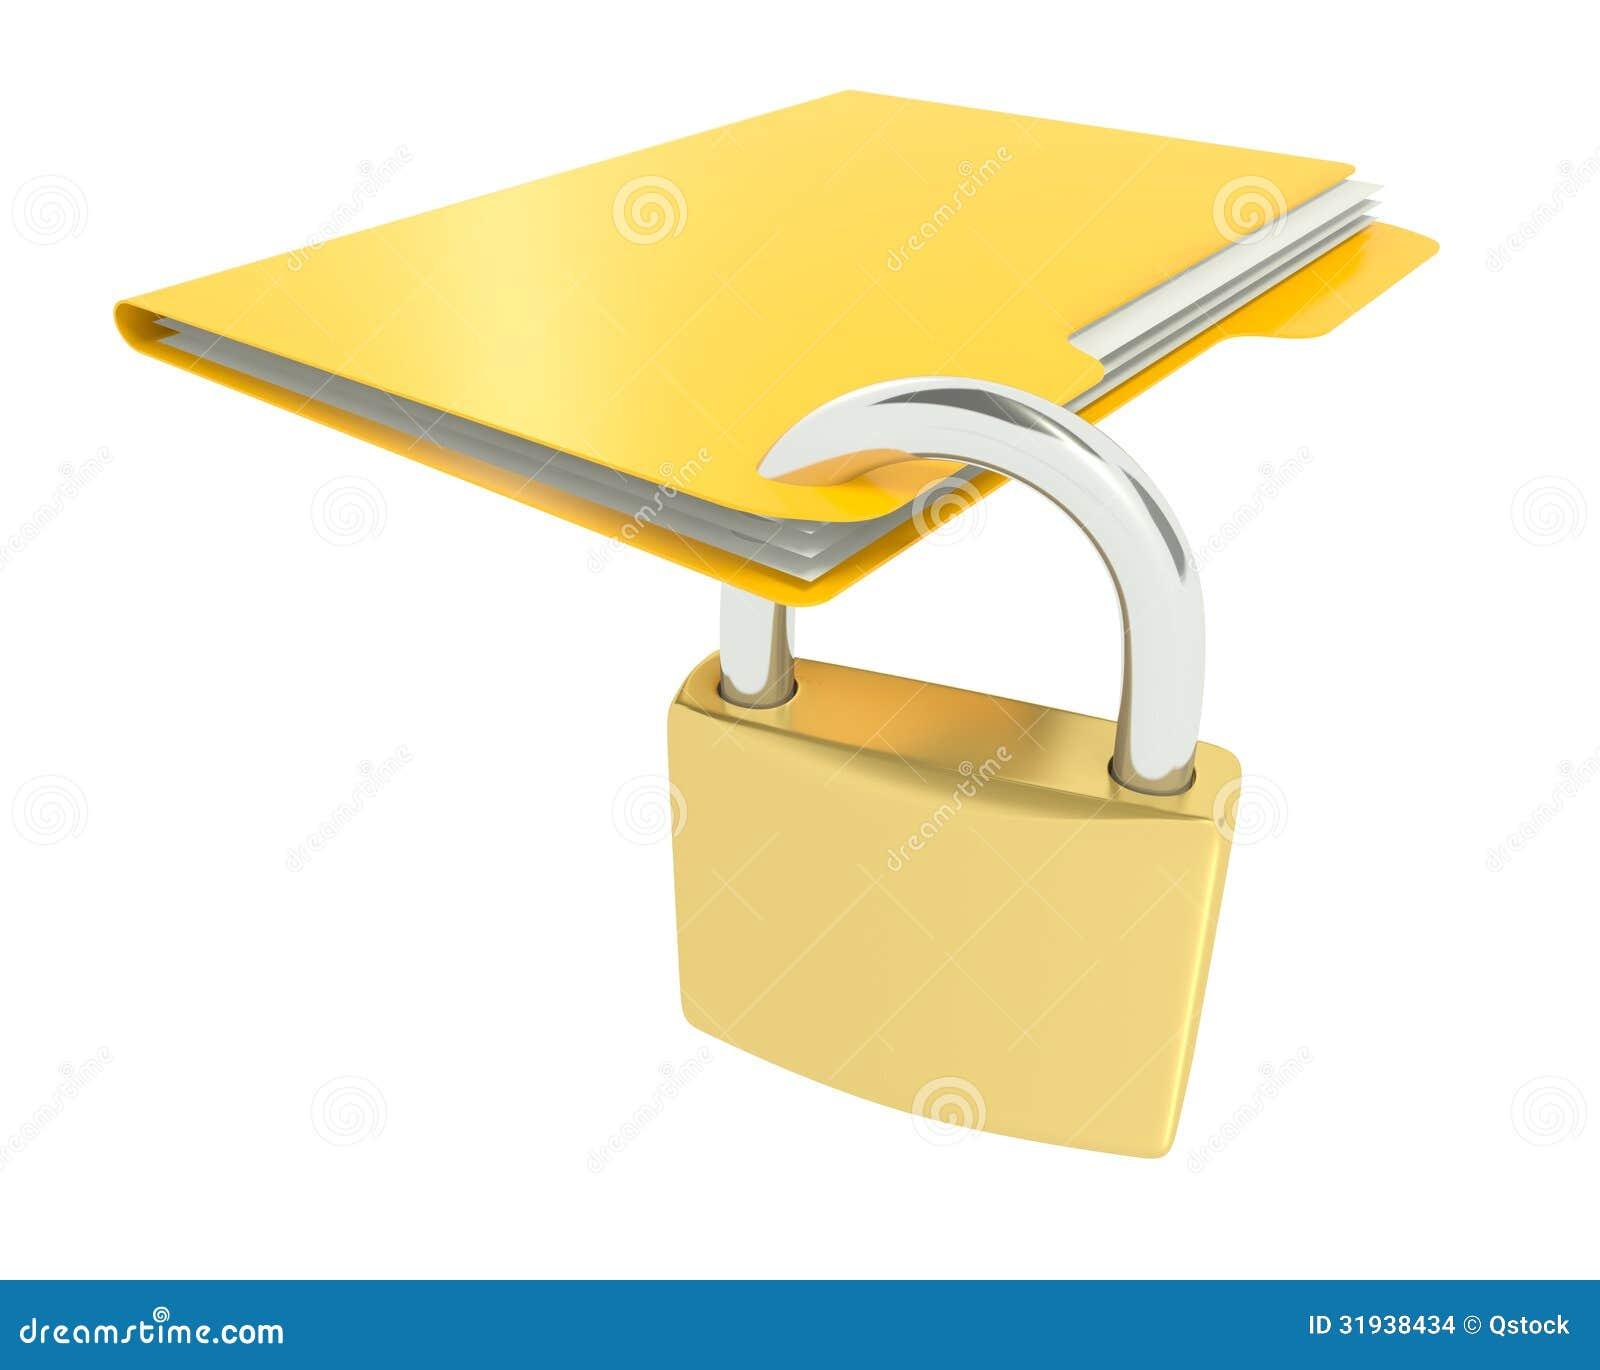 Secure File Clip Art